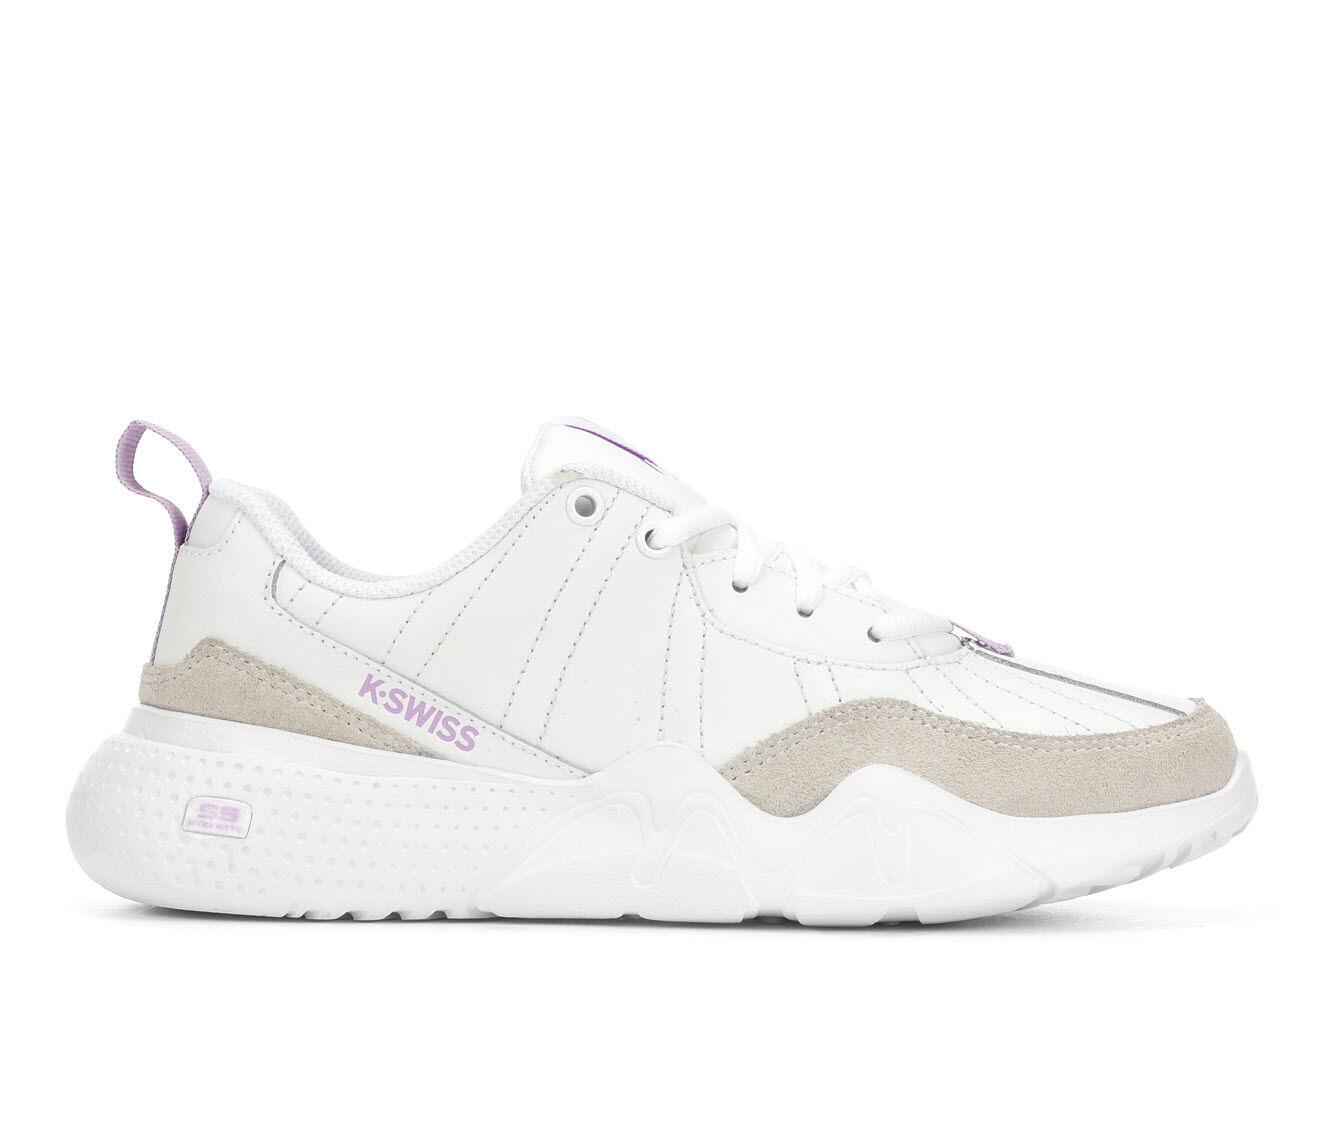 Buy Cheap Women's K-Swiss CR-329 LTR Tennis Shoes White/Lavendar